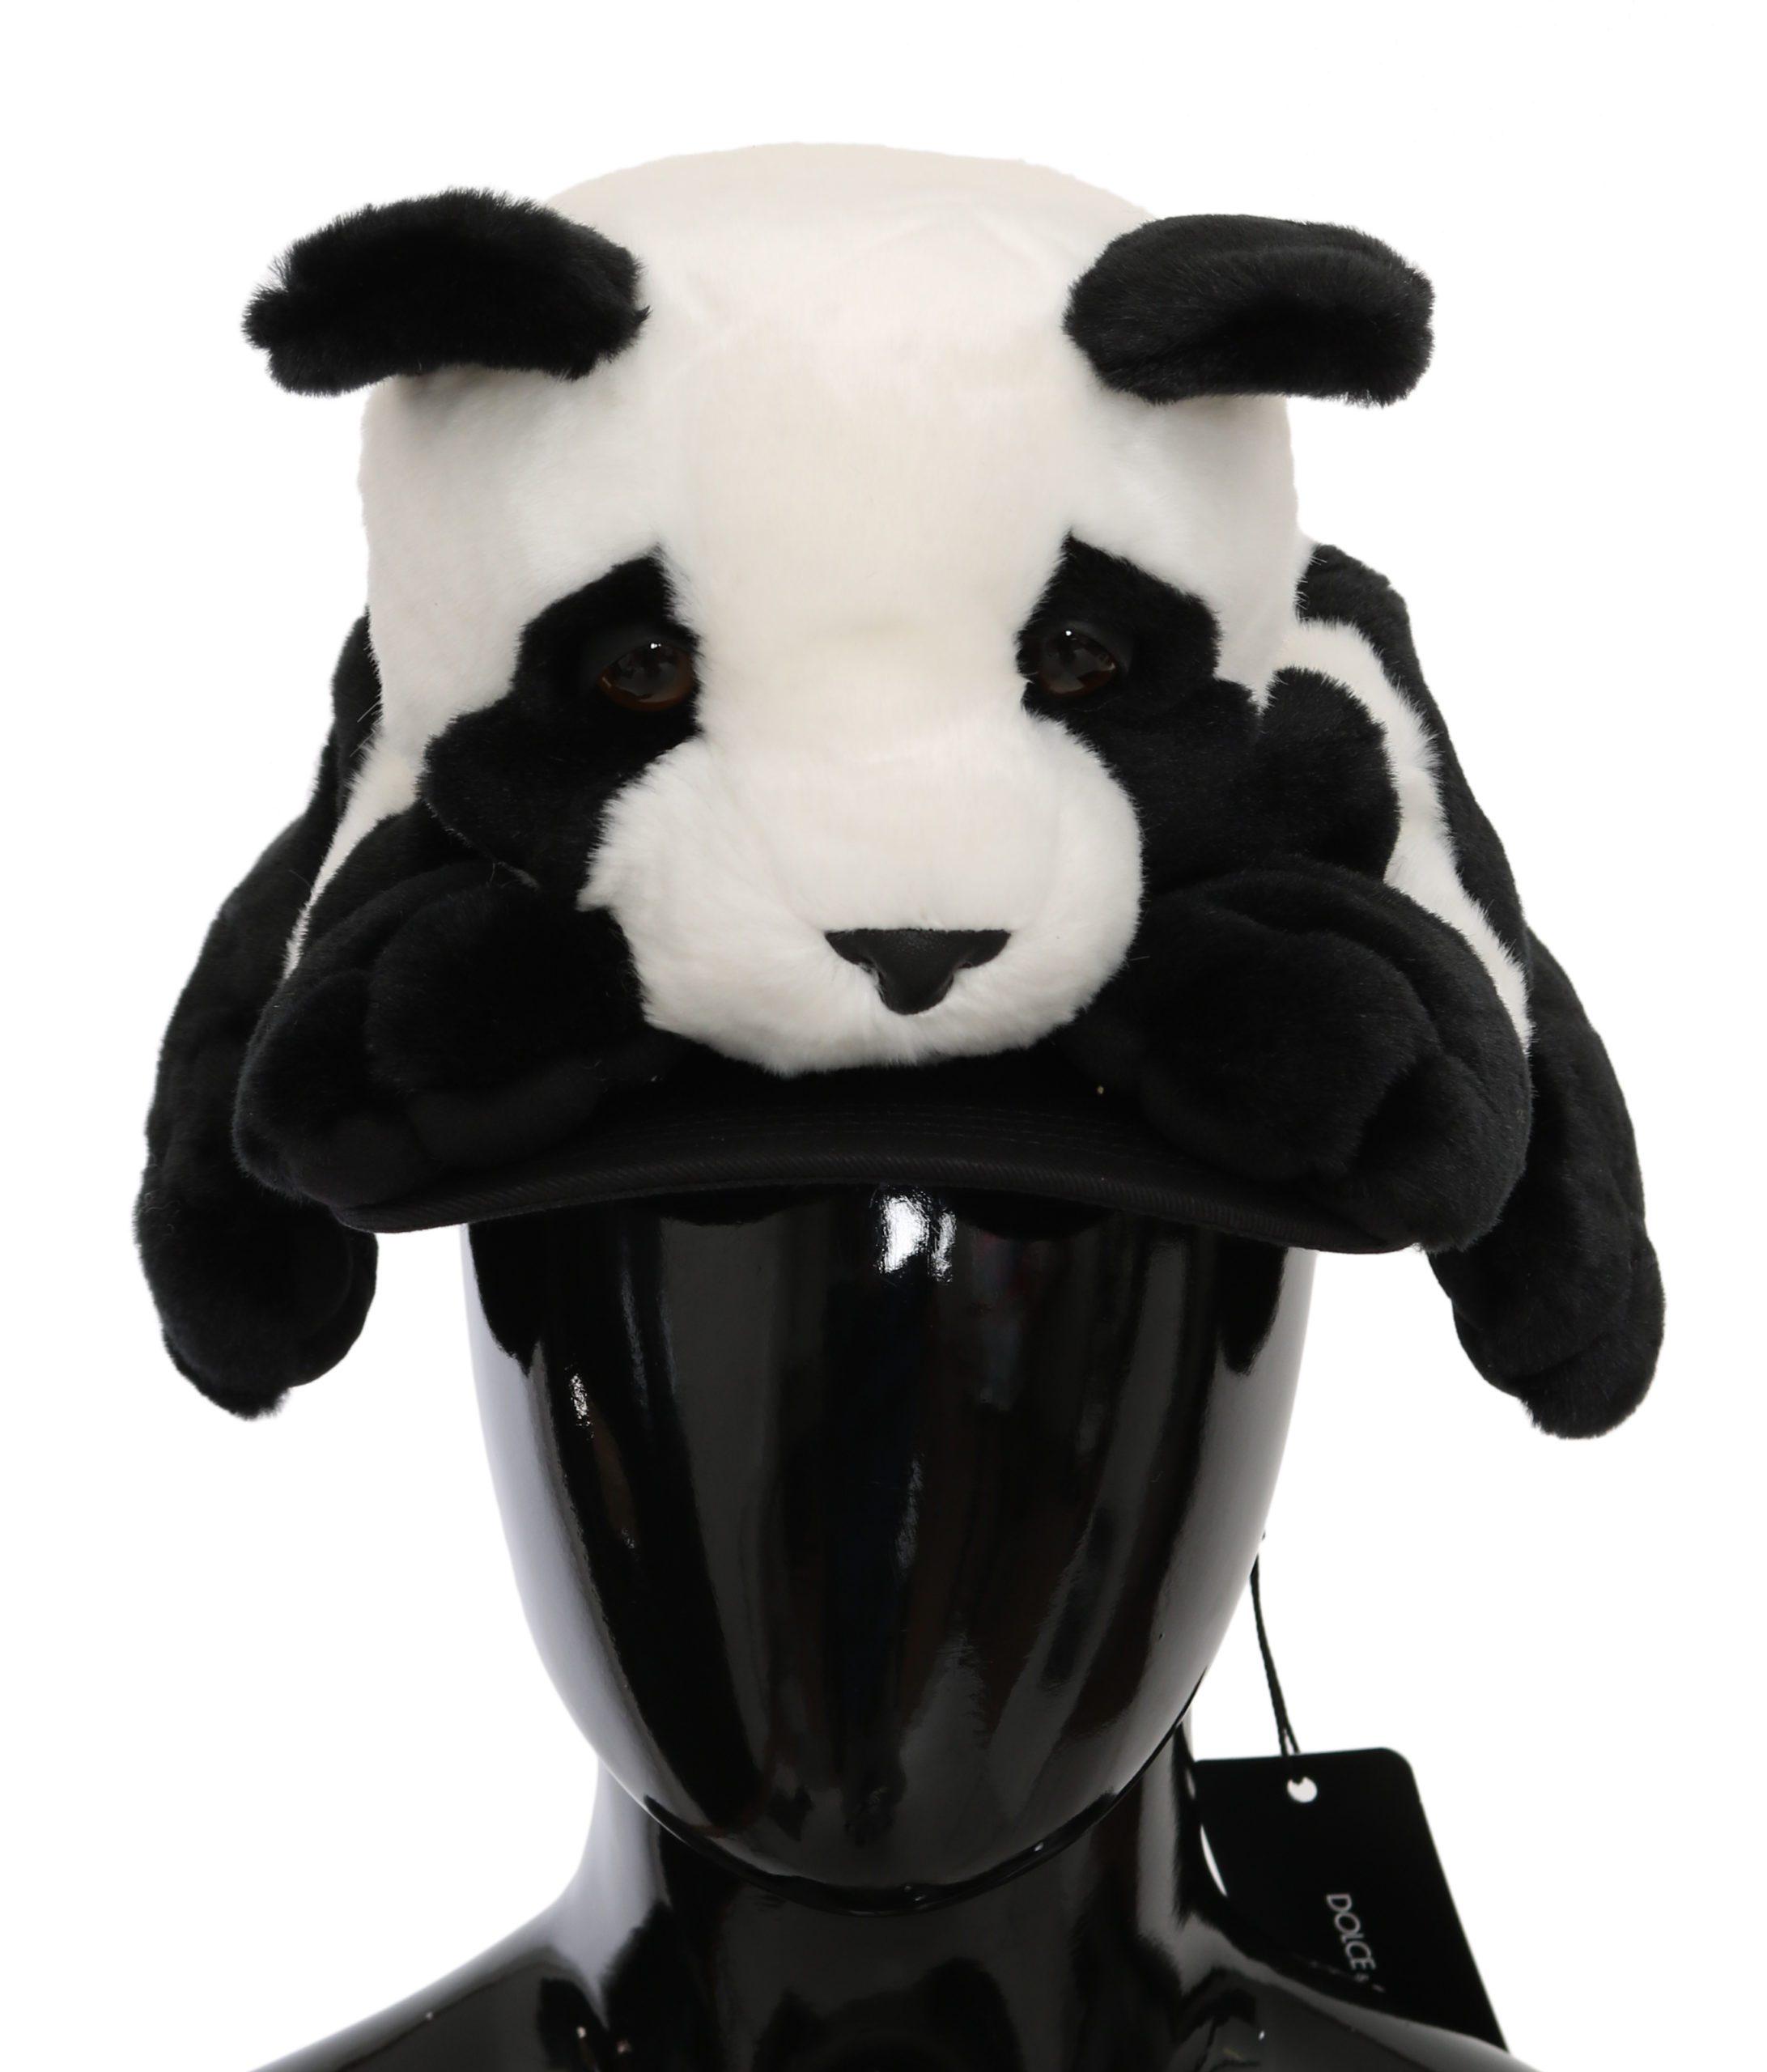 Dolce & Gabbana Women's Panda Fur Baseball Cotton Hat Black HAT9086 - 57 cm|S